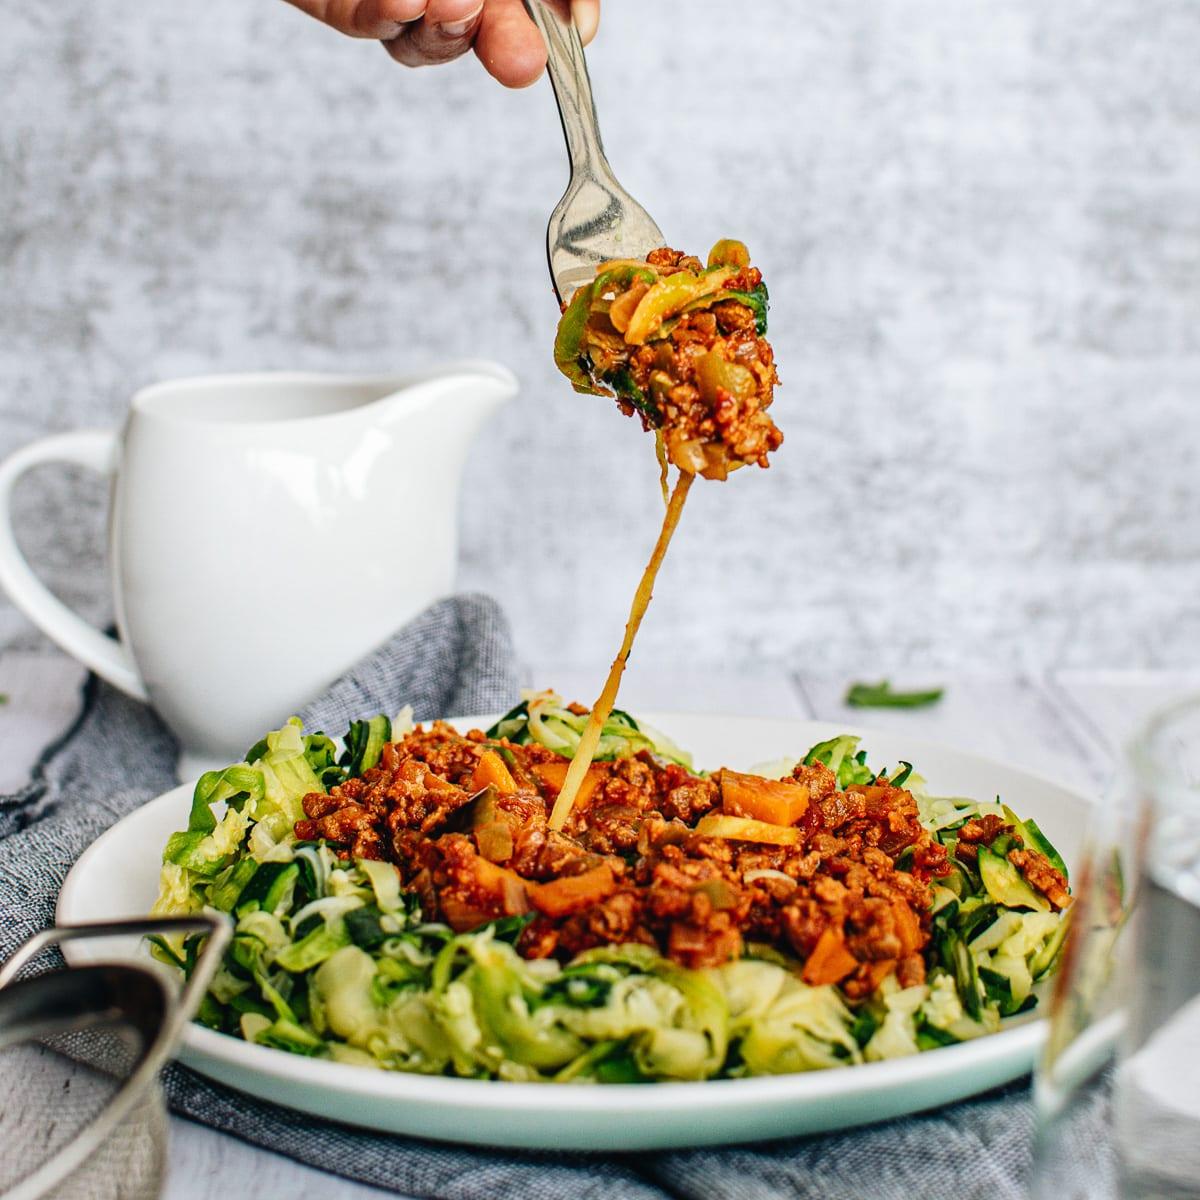 Vegan Zucchini Noodles with Vegan Bolognese